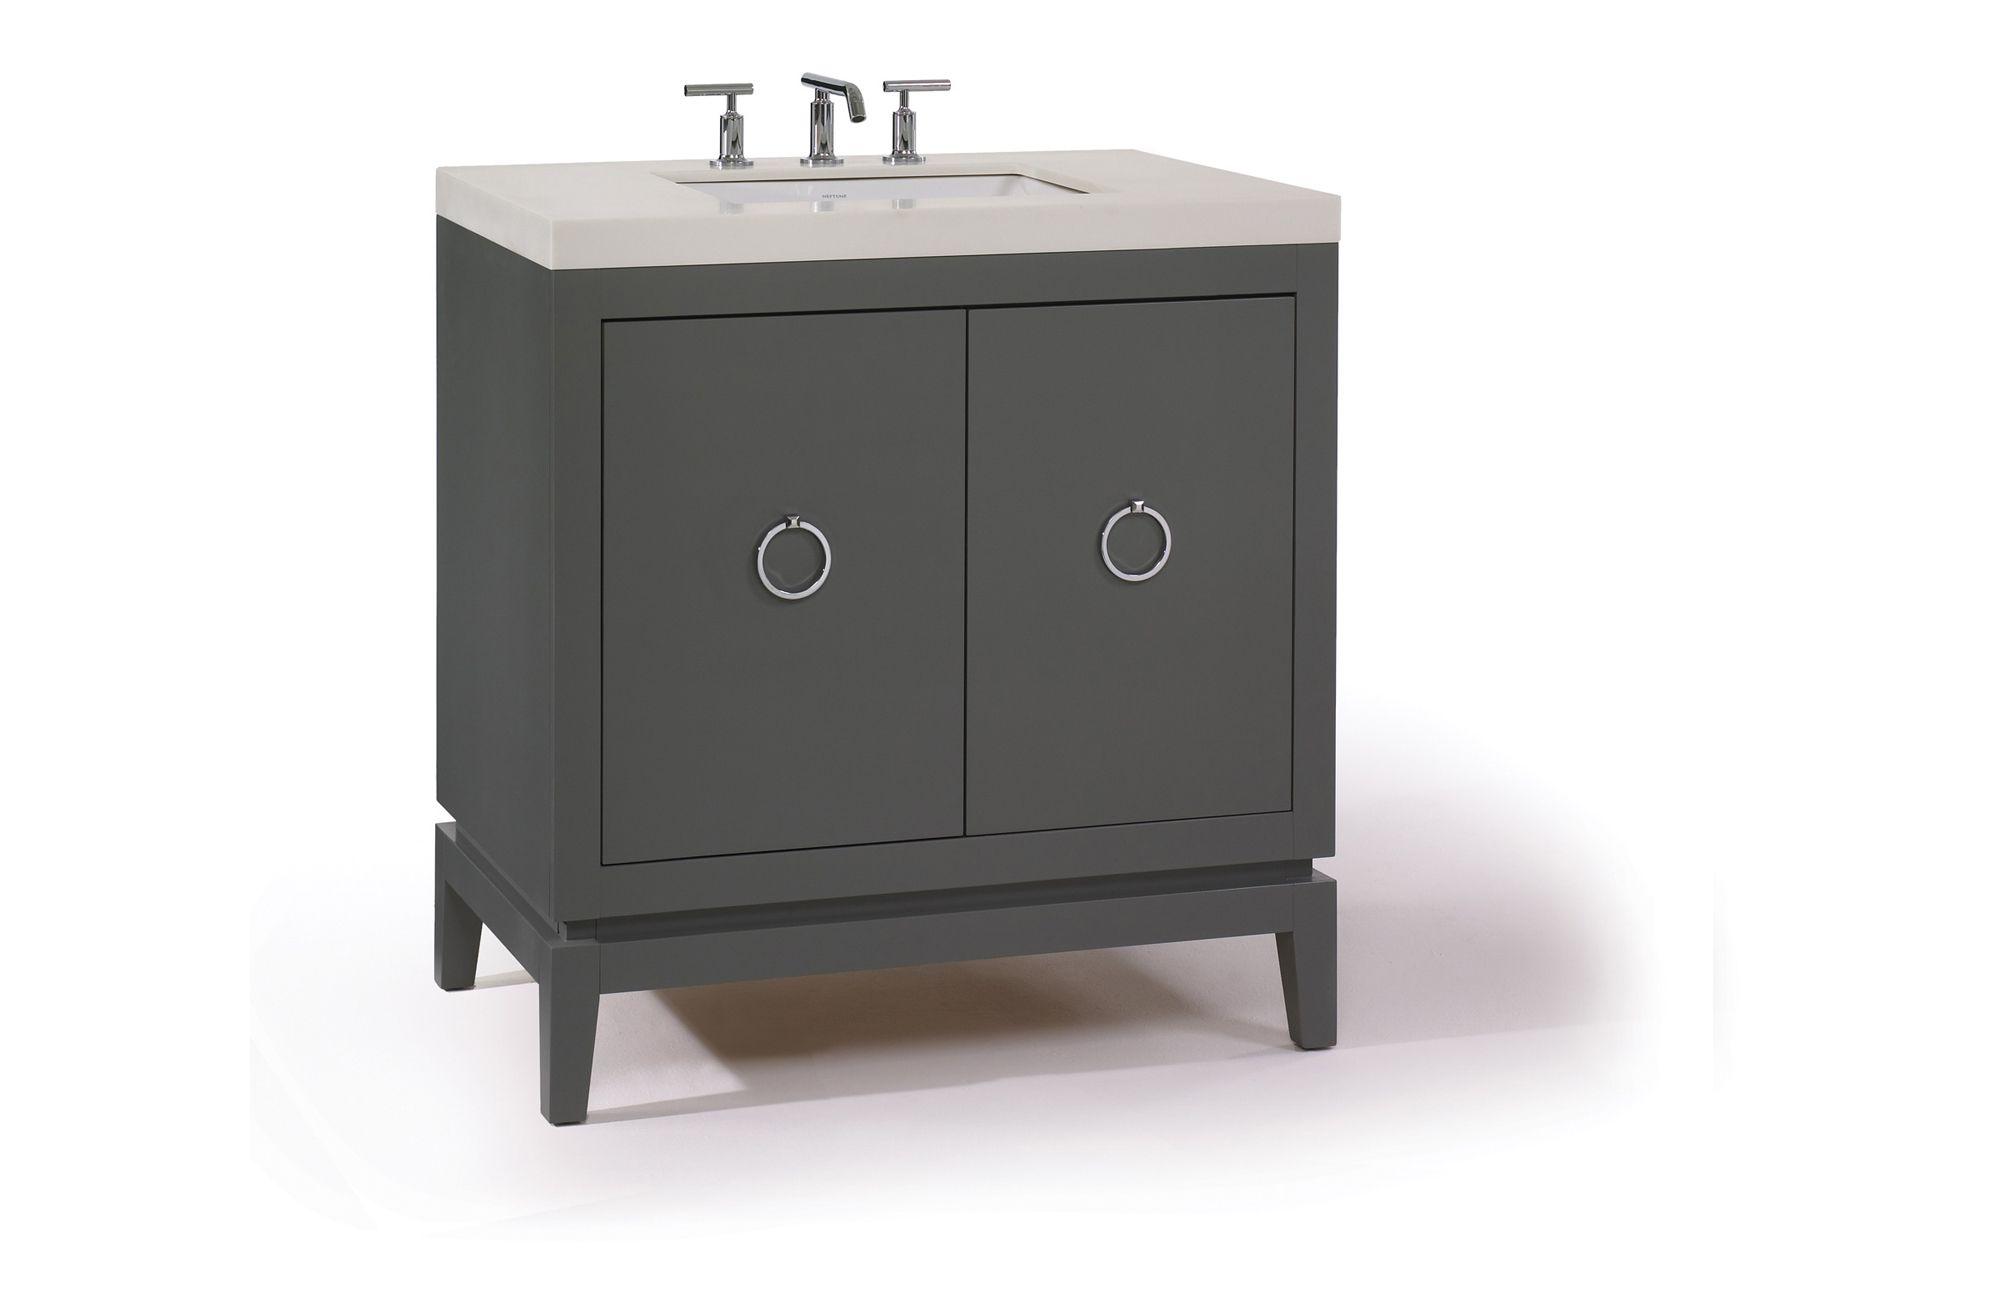 Artistic Tile Waterfall Bathroom Furniture The Diplomat 32